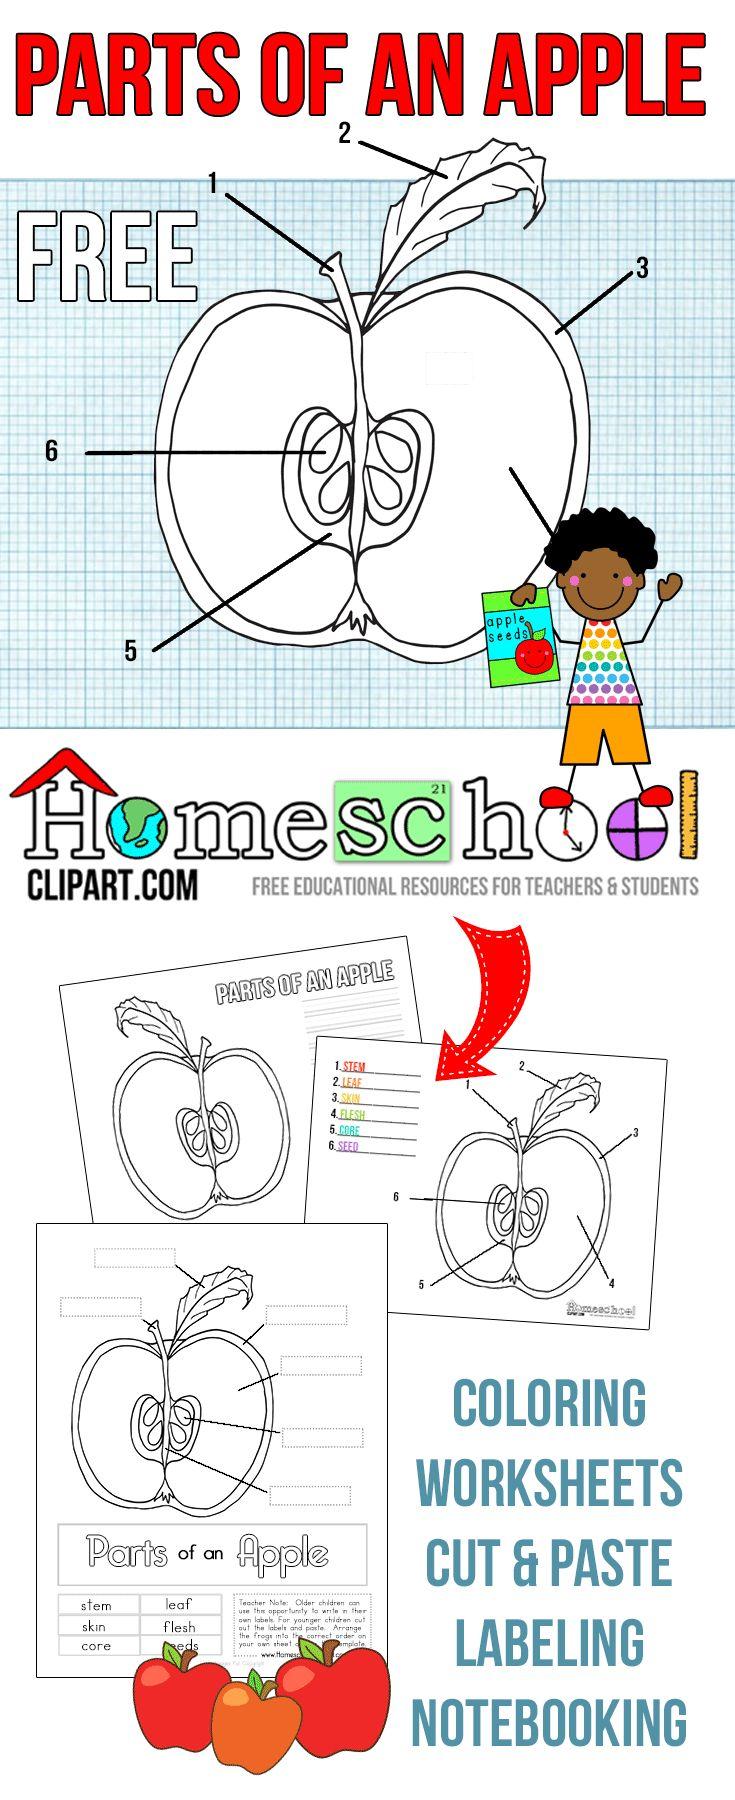 652 best Homeschooling images on Pinterest | School, Educational ...